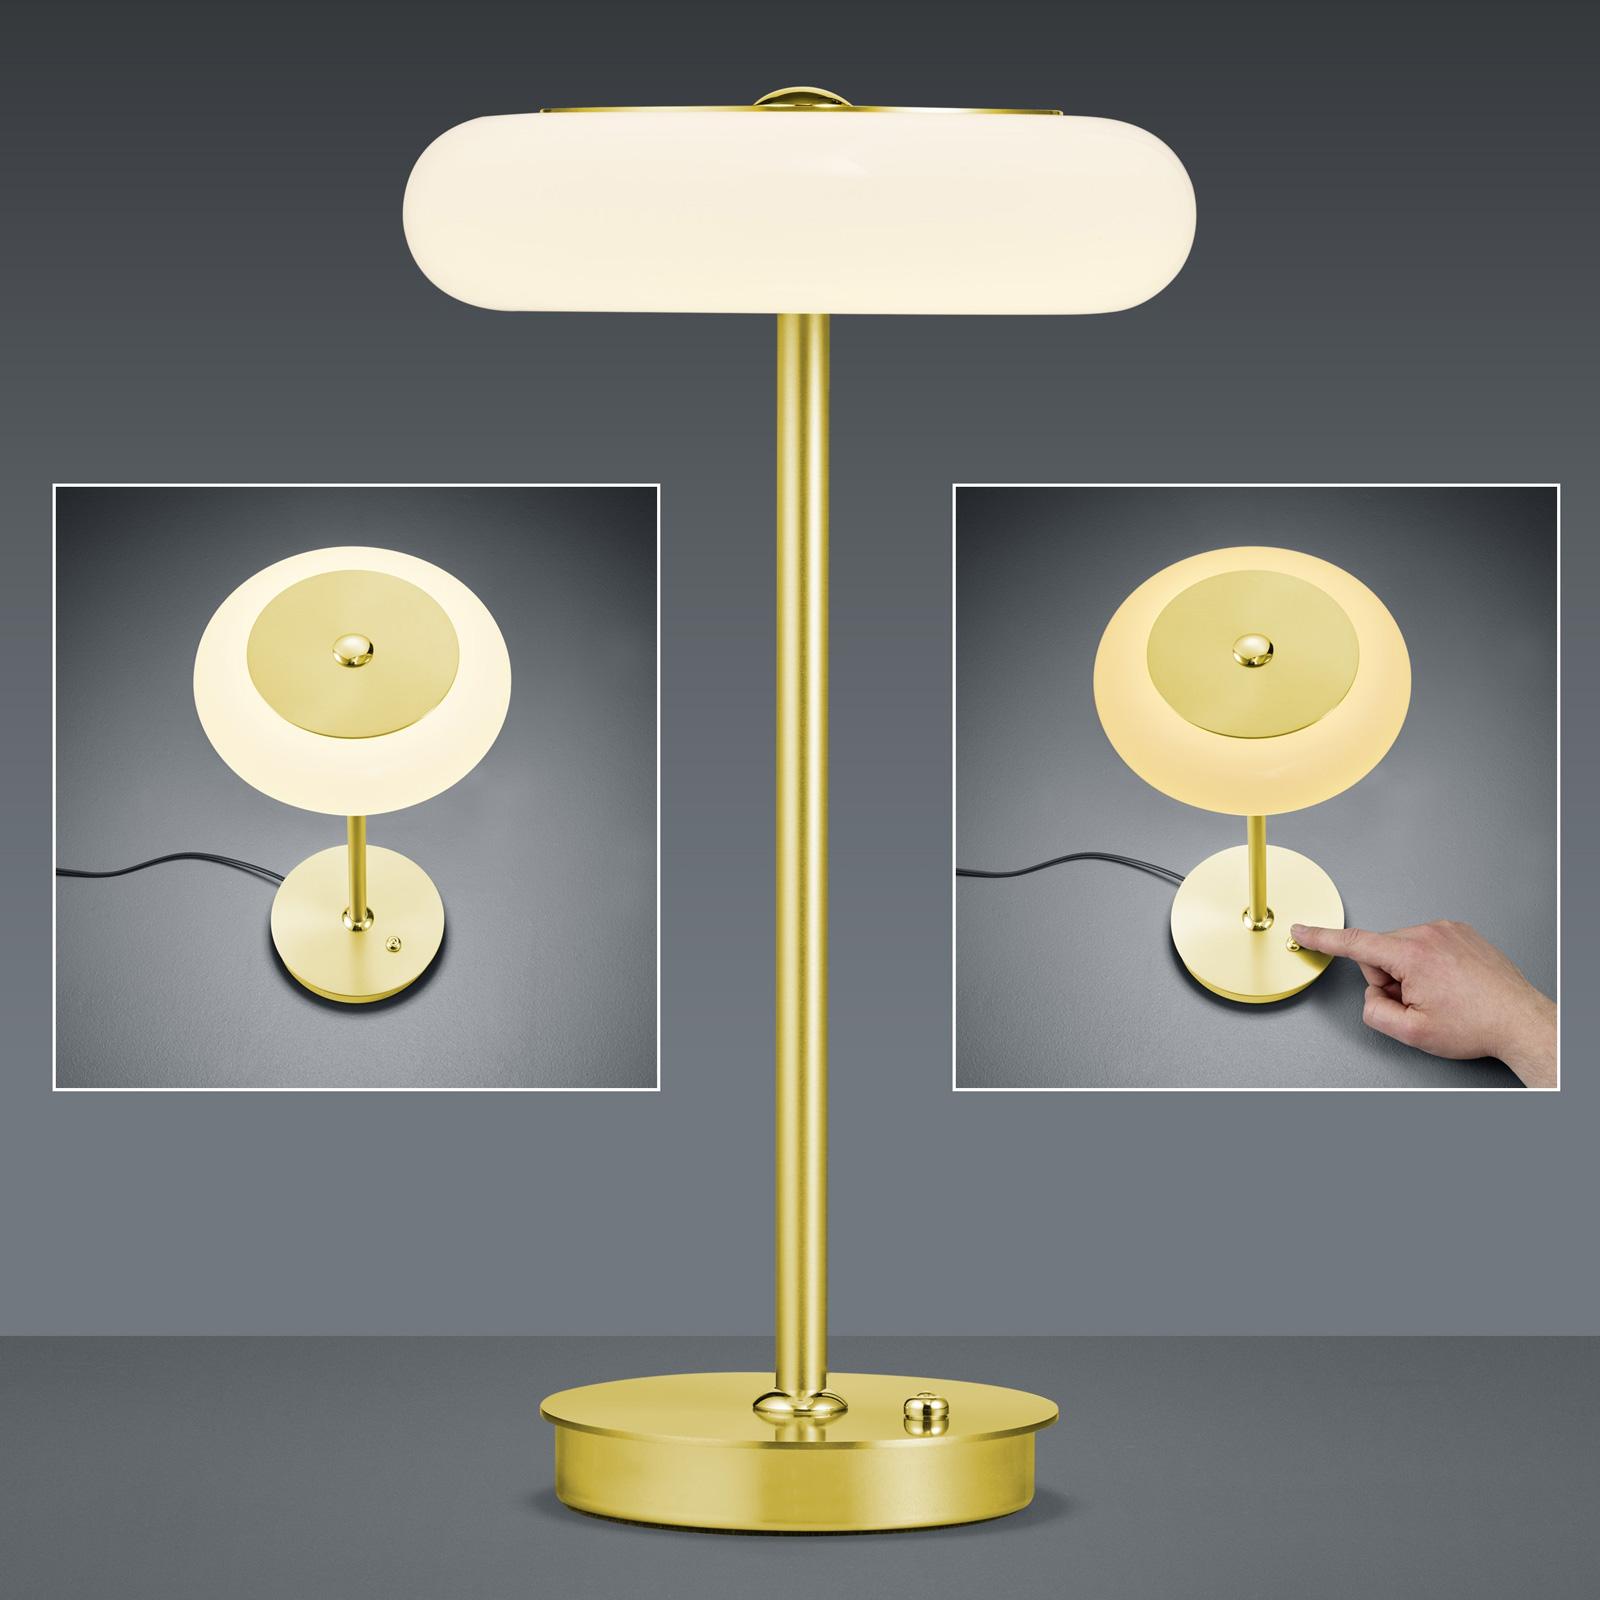 BANKAMP Centa LED-Tischleuchte, messing